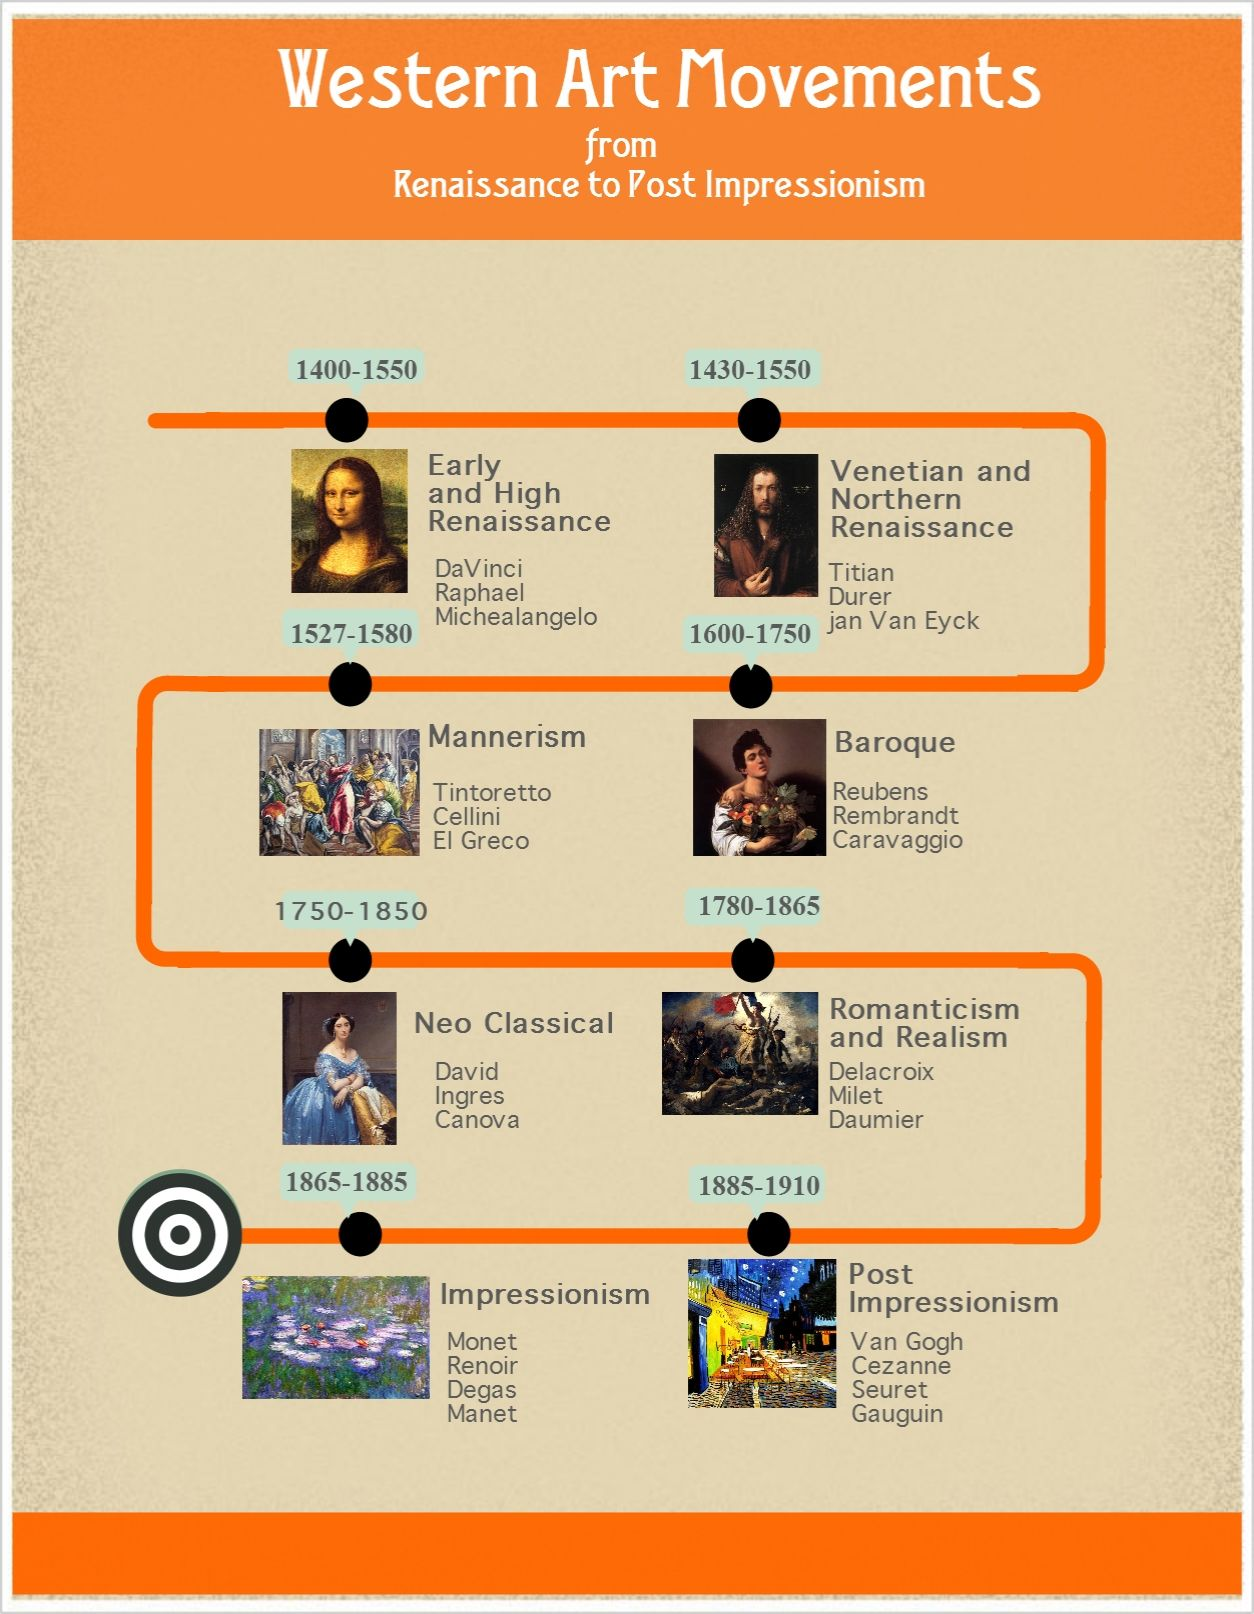 Western Art Movements Timeline